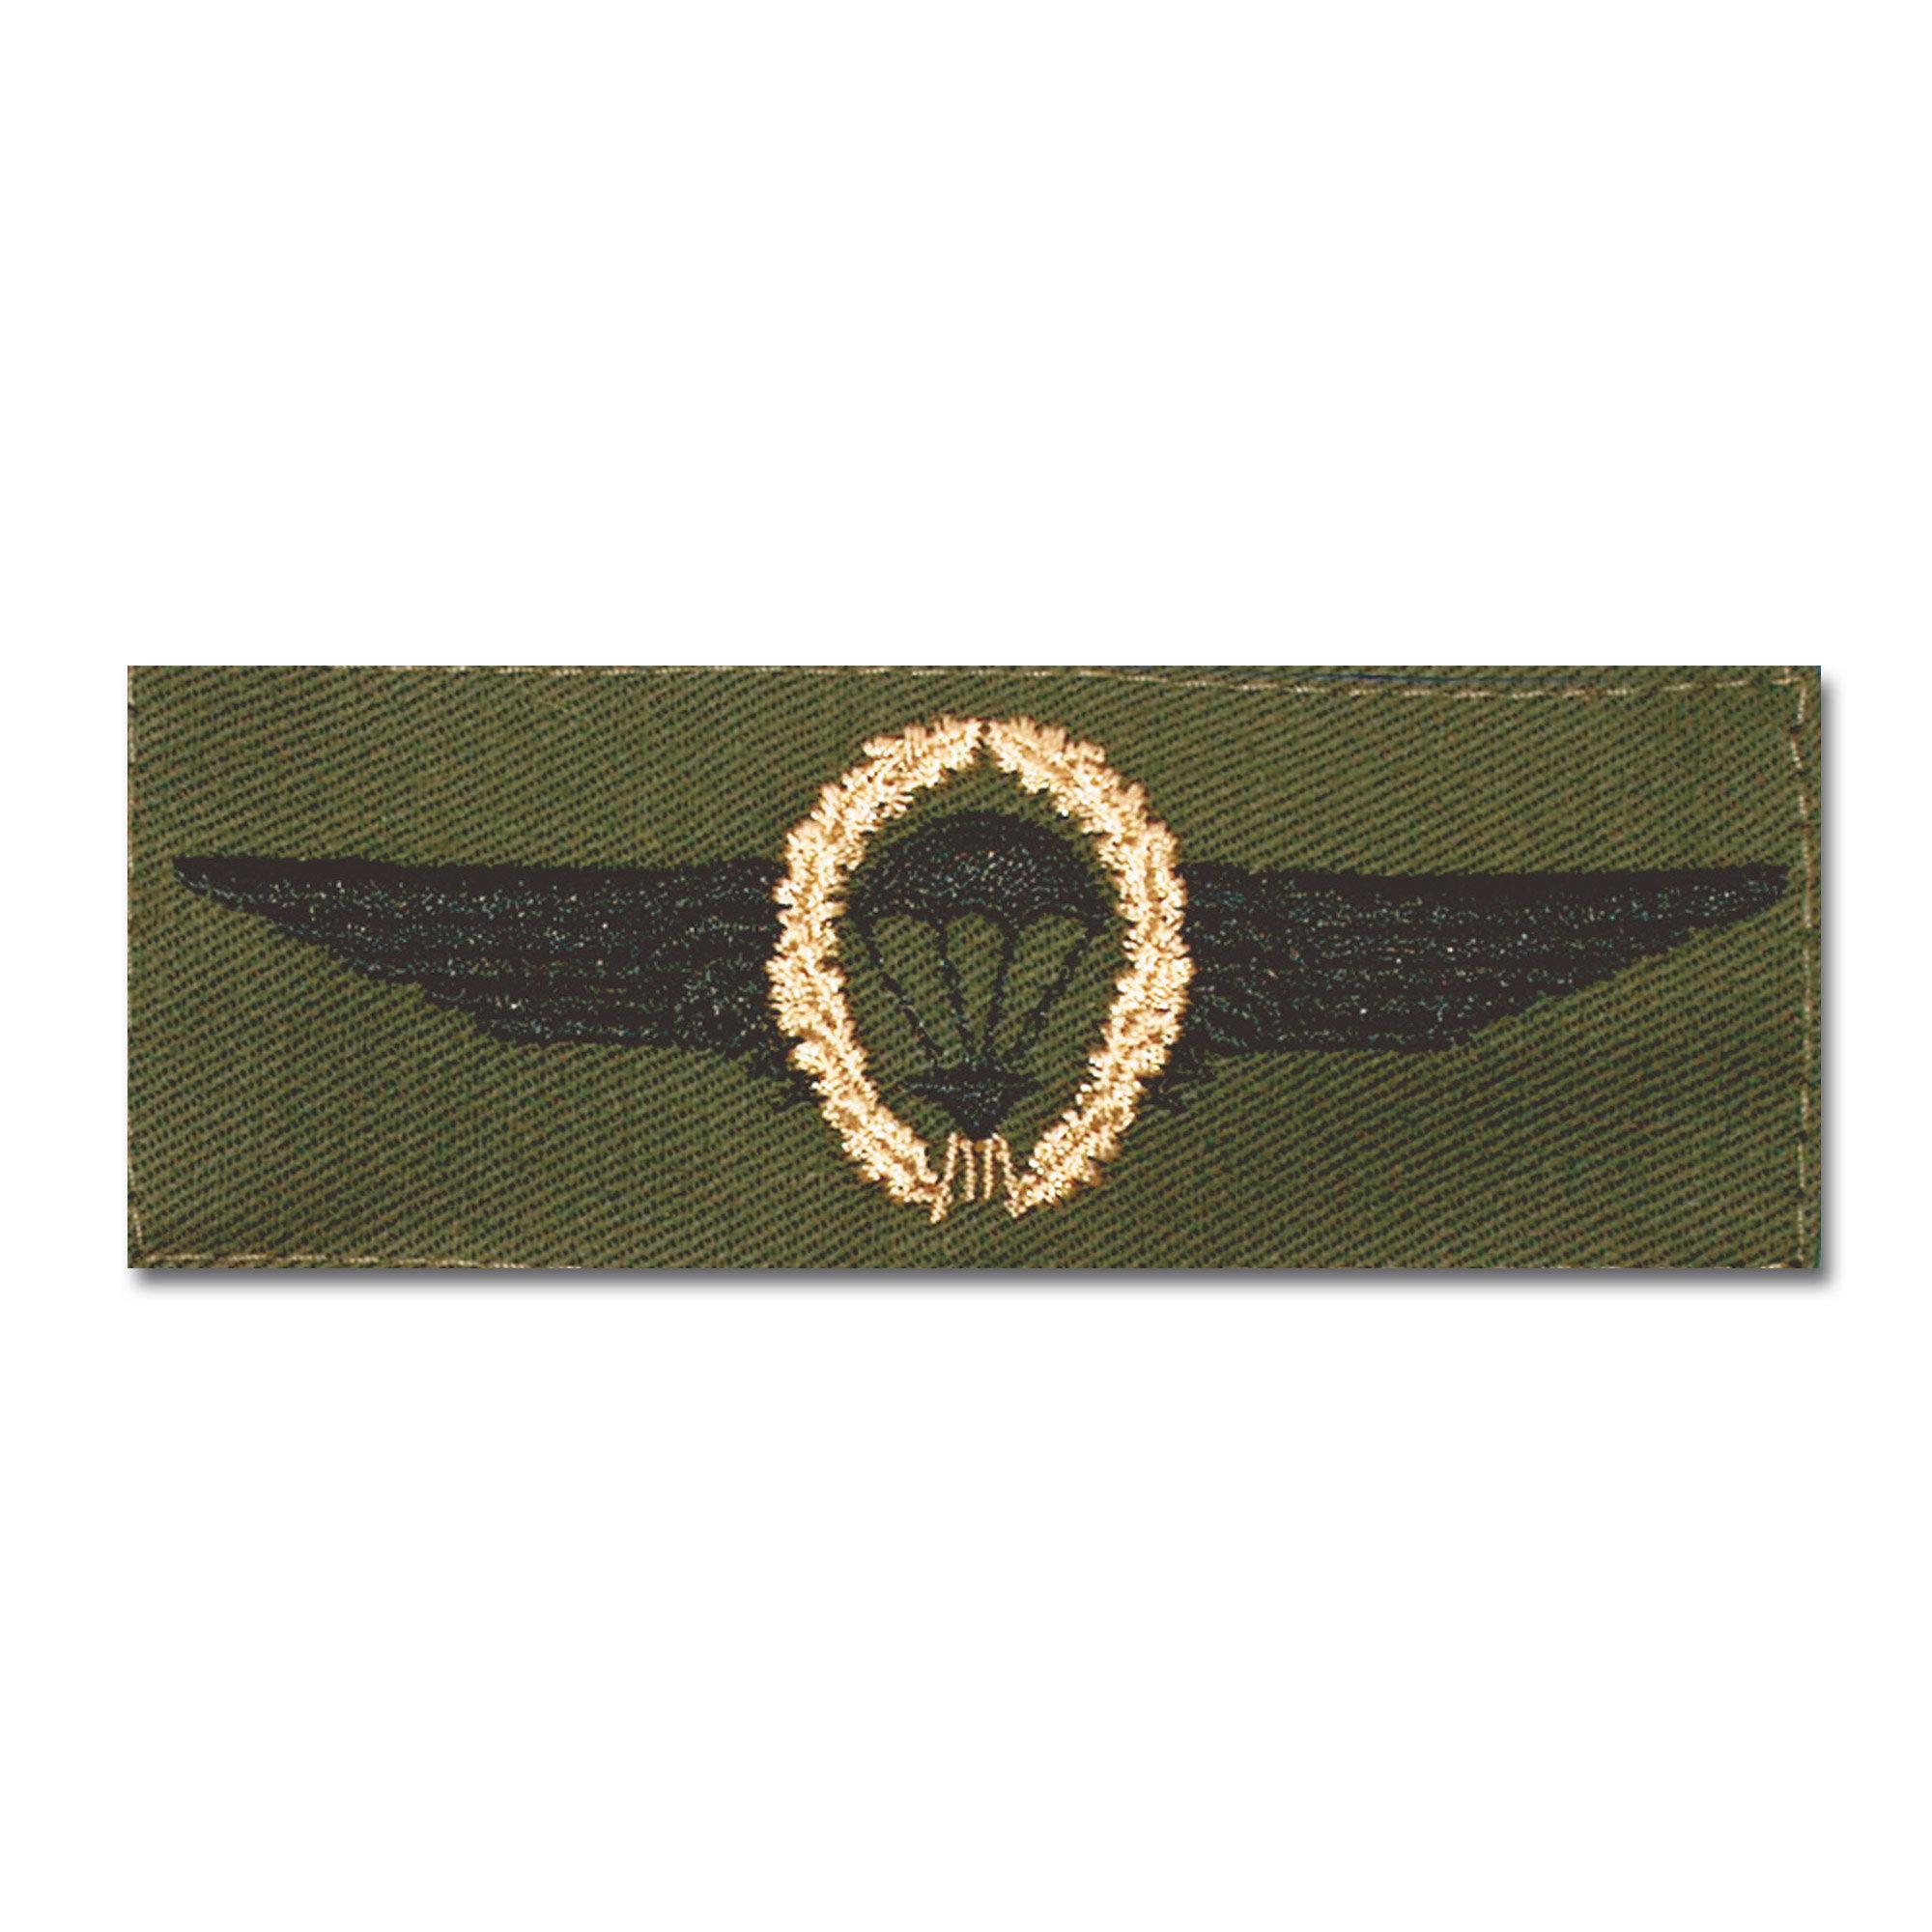 Distintivo in tessuto BW paracadutista bronzo/verde oliva